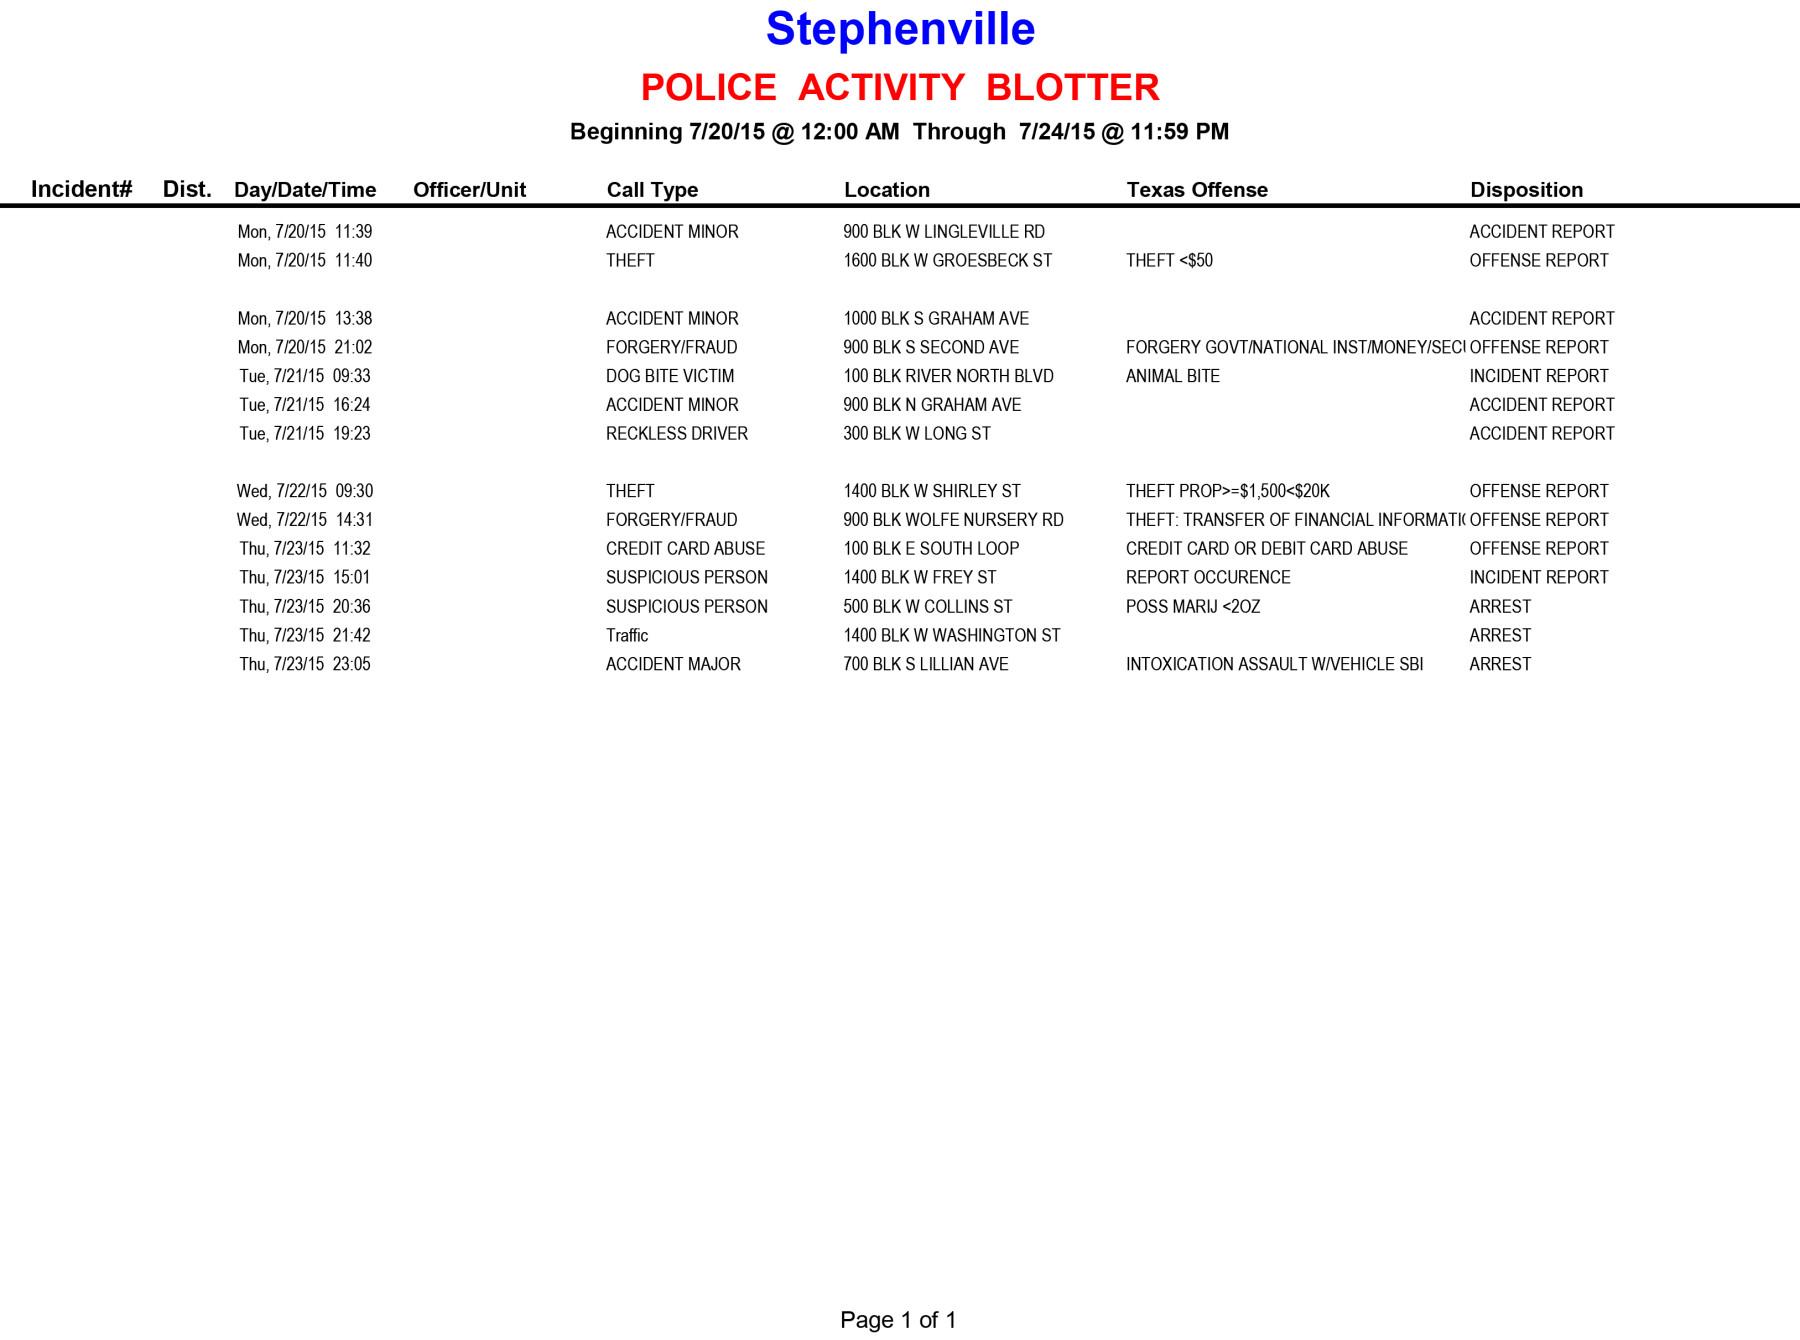 20150720-0724 Police Activity Blotter